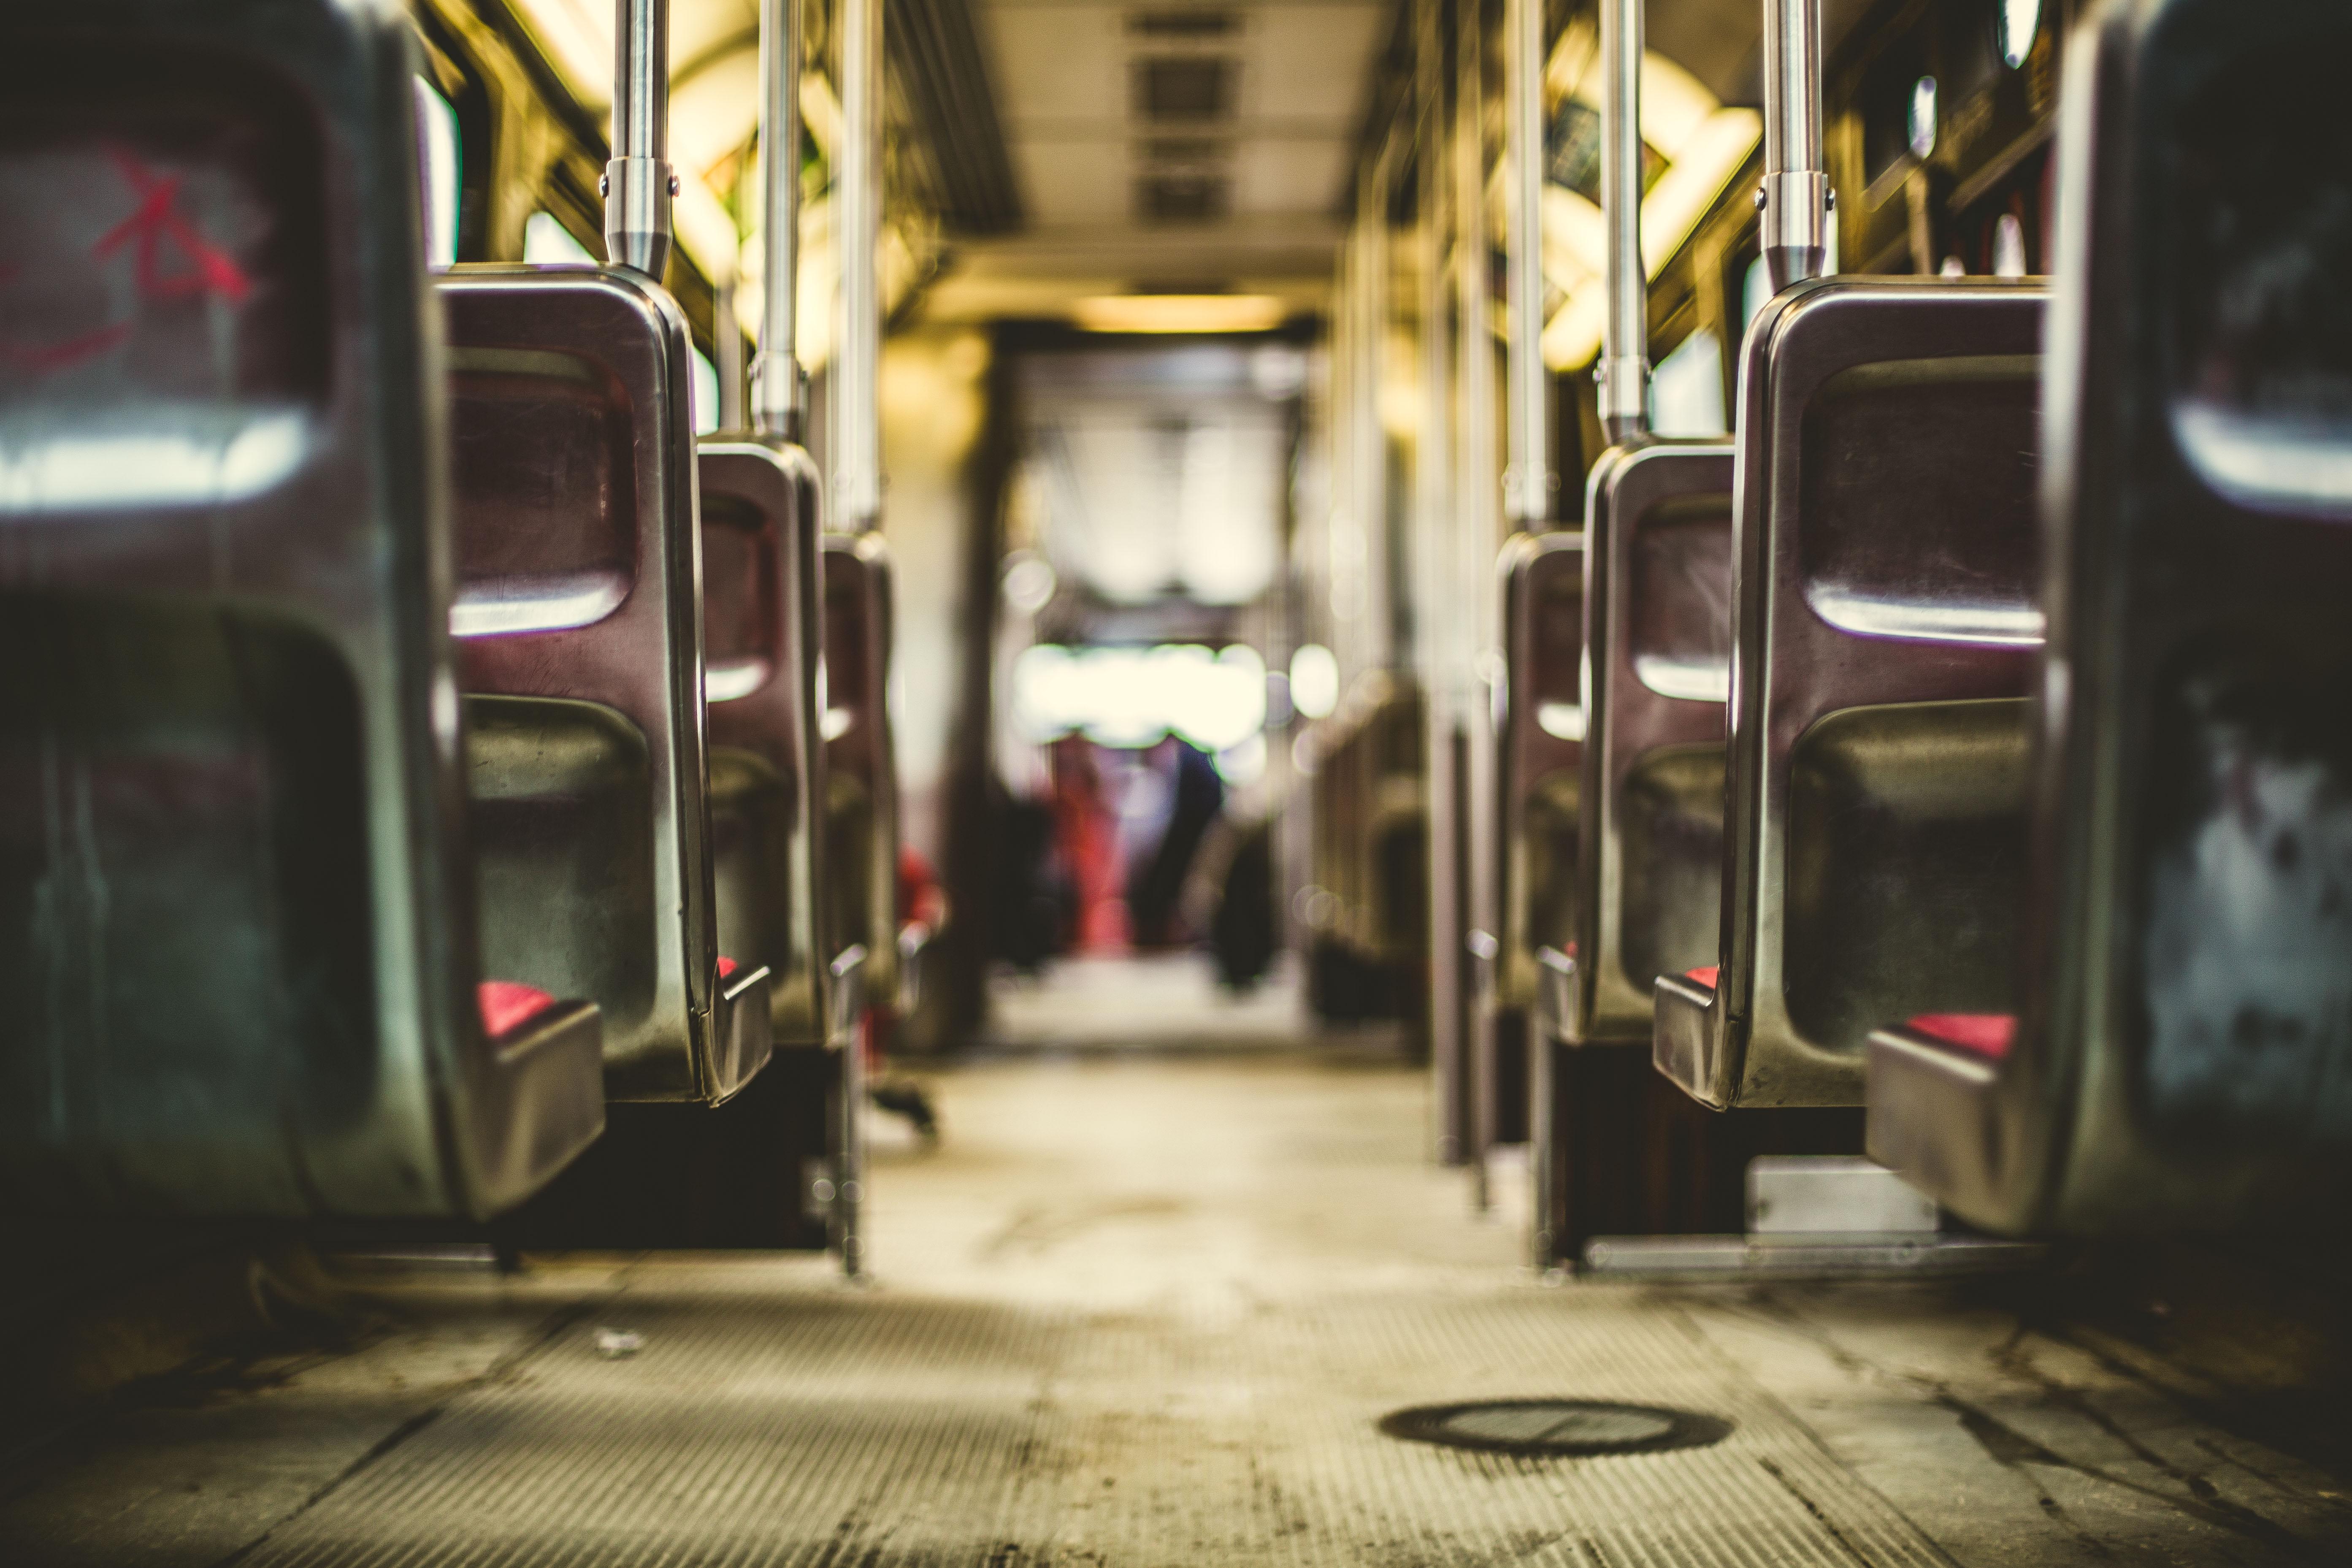 public-transportation-tram-bus-seats.jpeg